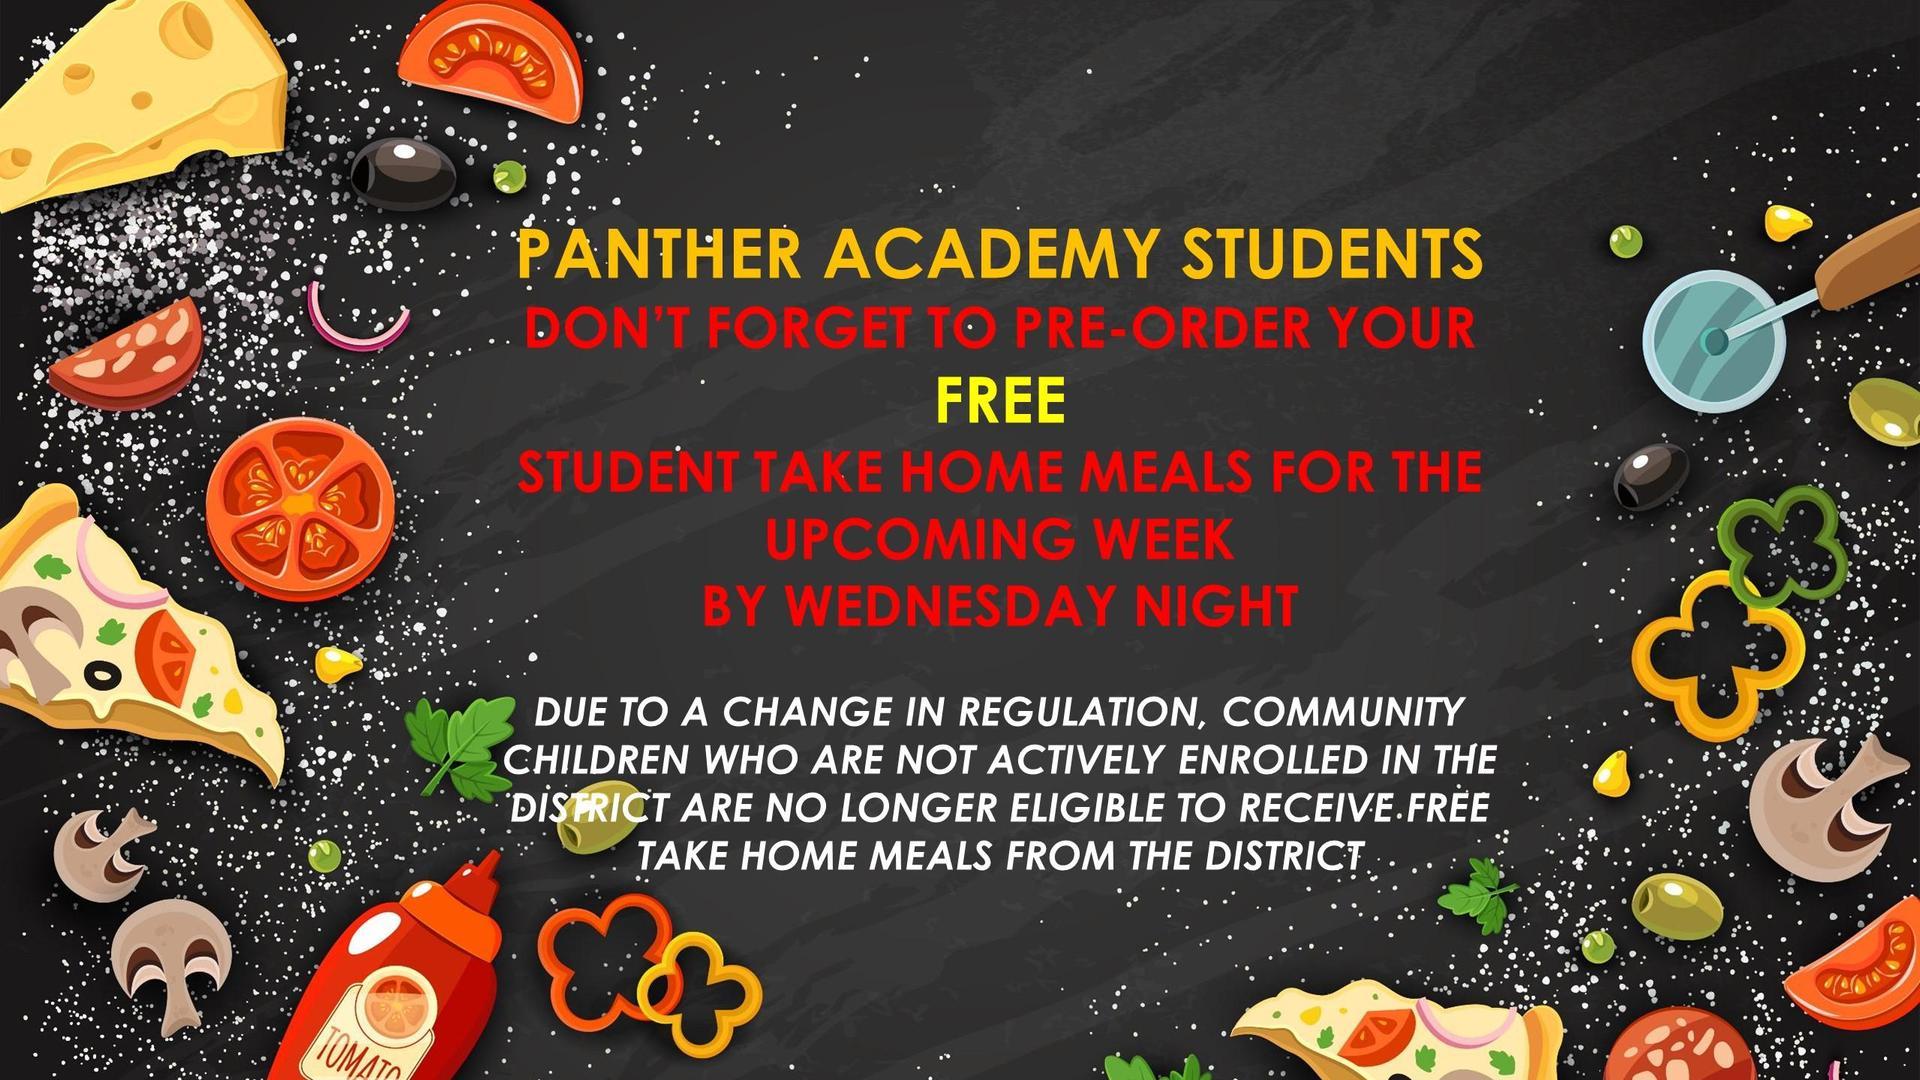 Panther Academy Take Home Meals Reminder Slide